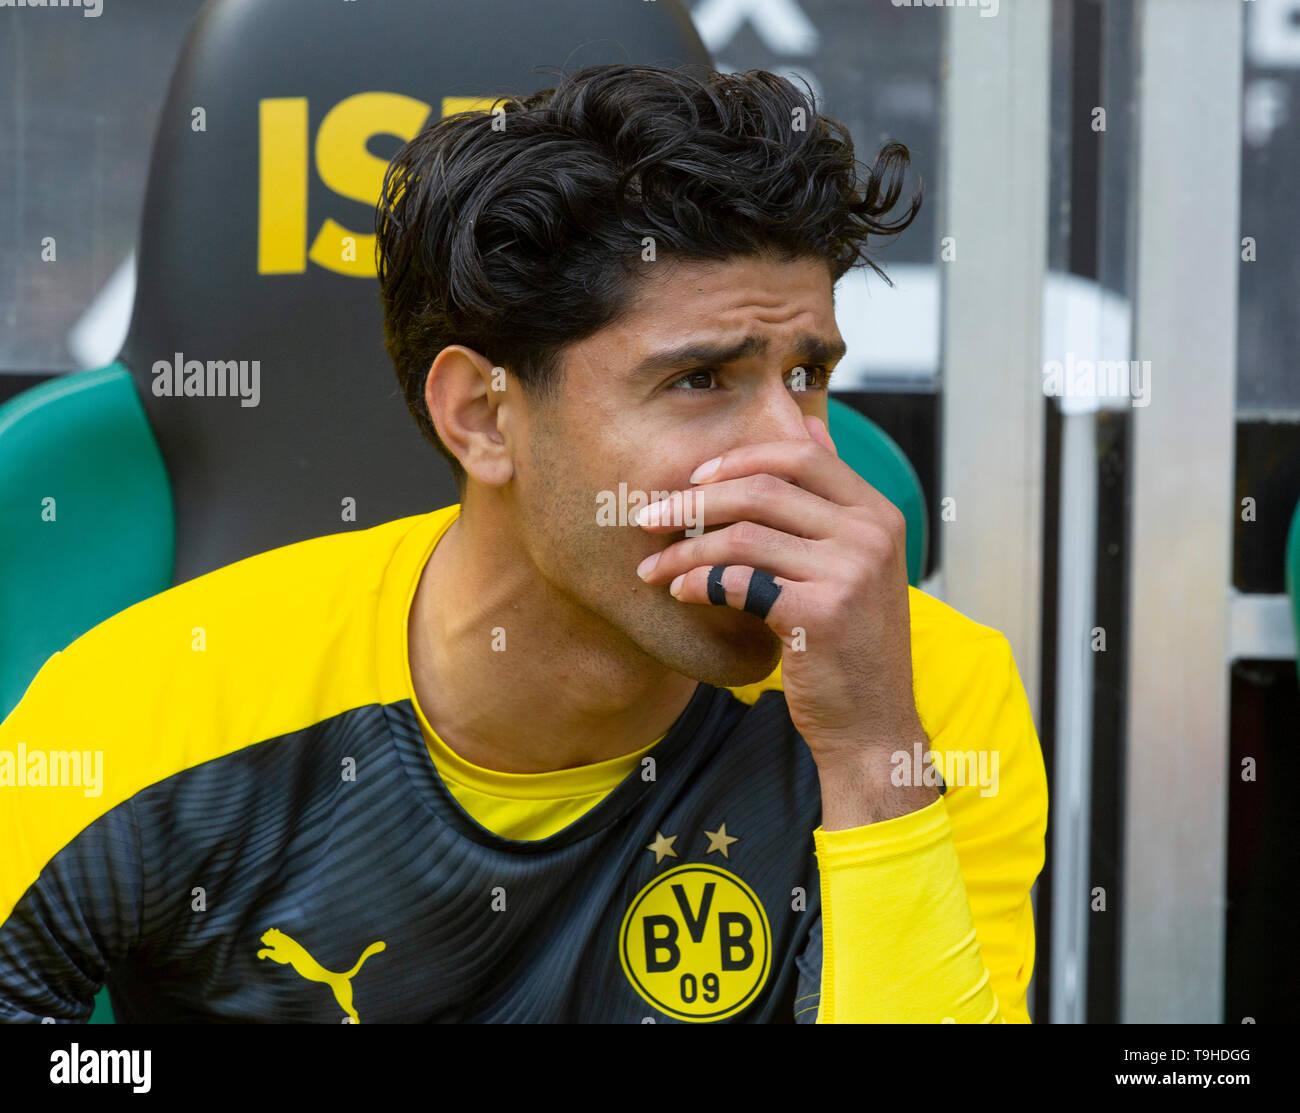 Sport, Fussball, Bundesliga, 2018/2019, Borussia Moenchengladbach vs. BVB Borussia Dortmund 0-2, Stadion Borussia-Park, Spielerbank, Mahmoud Dahoud (BVB), DFL REGULATIONS PROHIBIT ANY USE OF PHOTOGRAPHS AS IMAGE SEQUENCES AND/OR QUASI-VIDEO, sports, football, Bundesliga, 2018/2019, Borussia Moenchengladbach vs. BVB Borussia Dortmund 0-2, Stadium Borussia Park, players bench, Mahmoud Dahoud (BVB), DFL REGULATIONS PROHIBIT ANY USE OF PHOTOGRAPHS AS IMAGE SEQUENCES AND/OR QUASI-VIDEO *** Local Caption *** sports, football, Bundesliga, 2018/2019, Borussia Moenchengladbach vs. BVB Borussia Dortmund - Stock Image